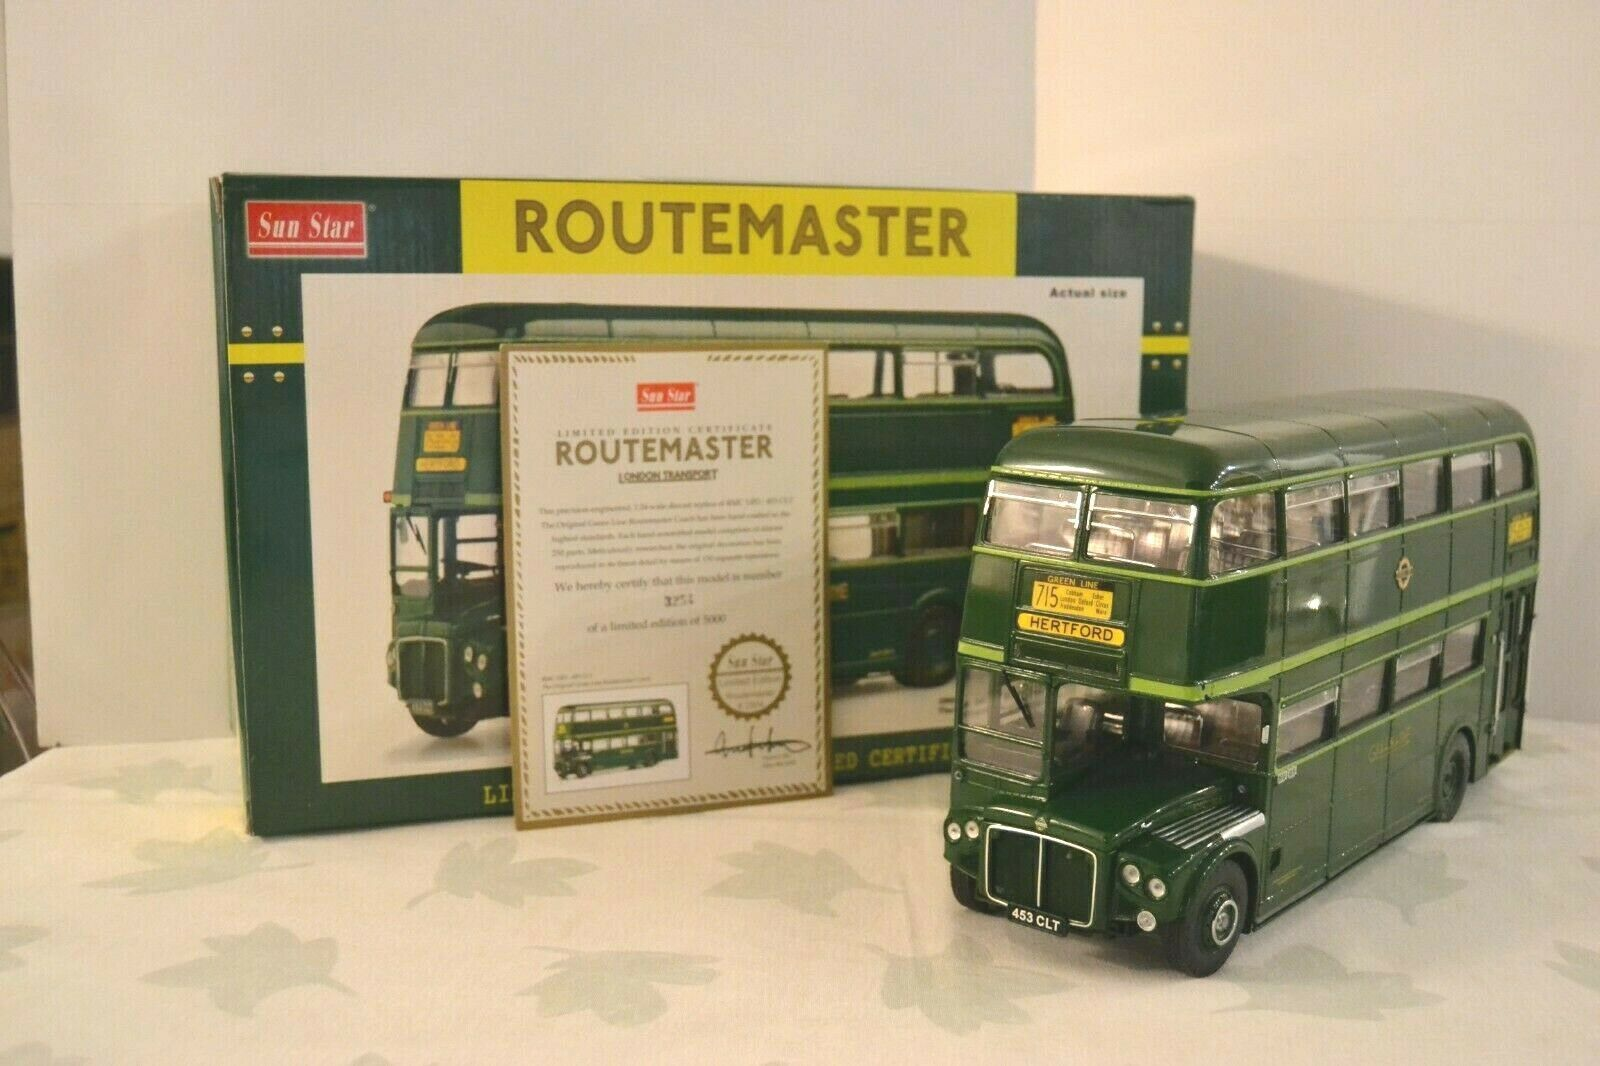 Sun Star 1 24 AEC Routemaster RMC1453-453 CLT 1965 Green Line London Réf. 2904.